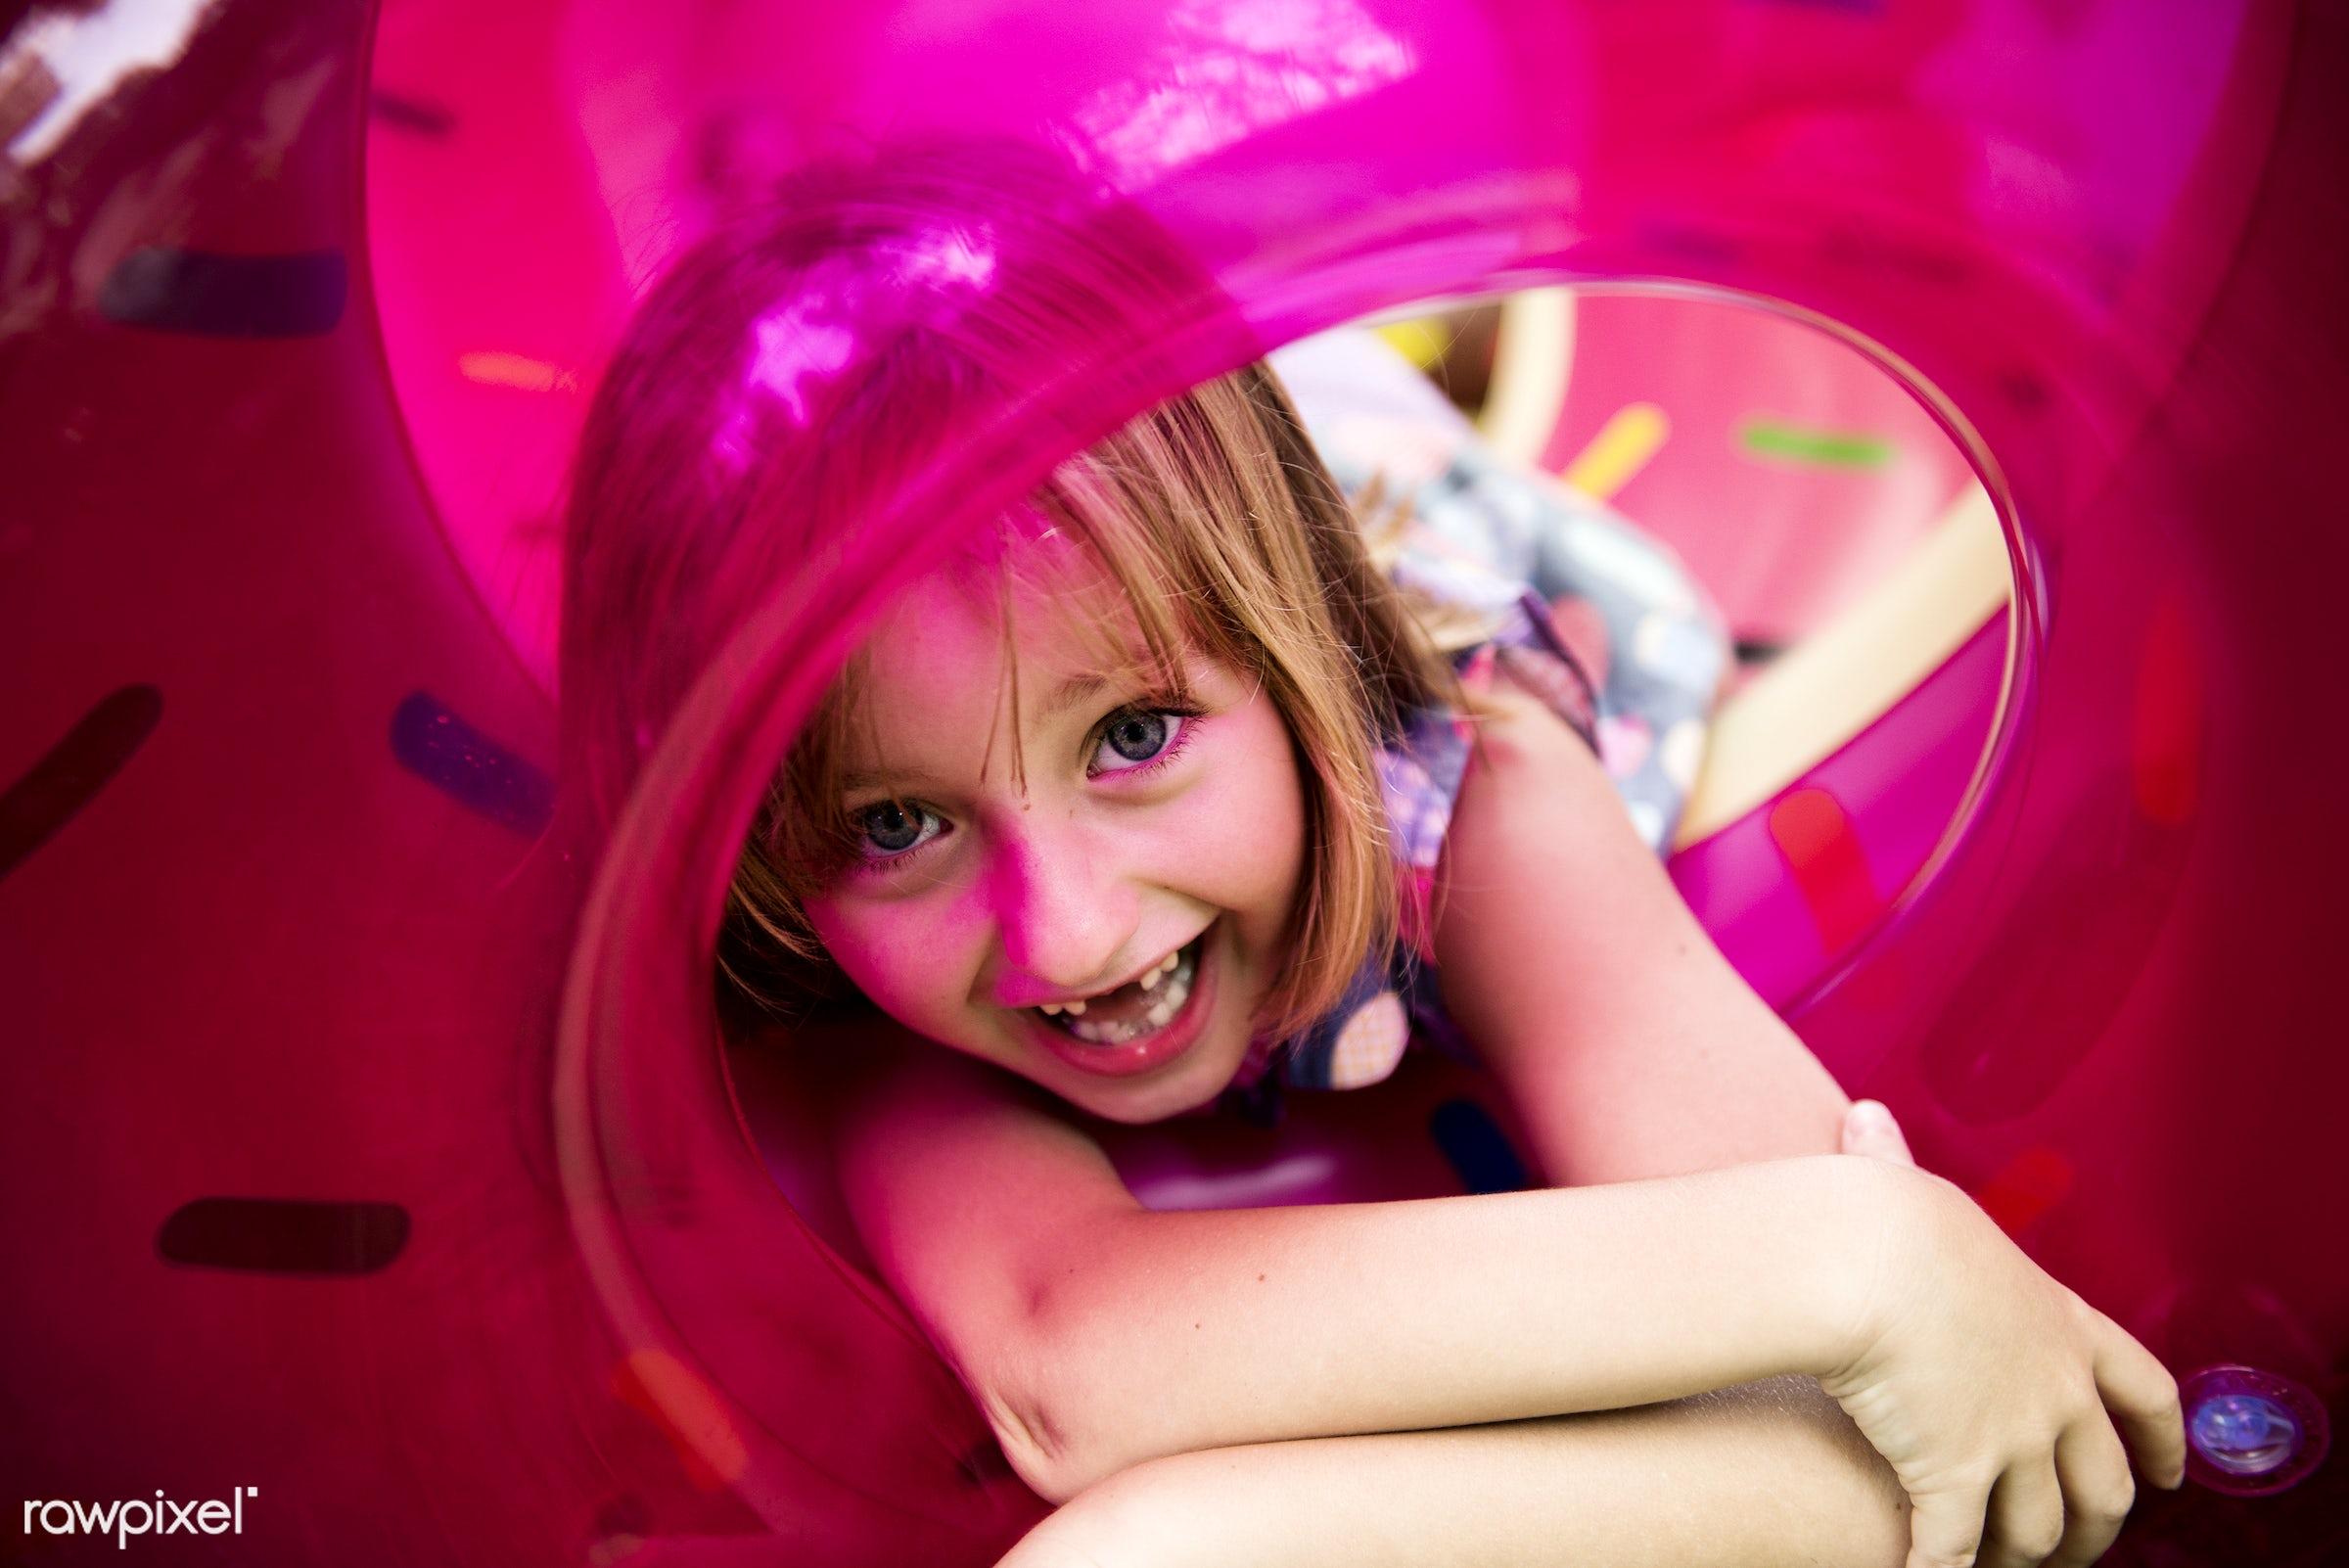 aerial view, alone, boy, caucasian, cheerful, child, enjoy, enjoying, enjoyment, flamingo, floating, fun, happiness,...